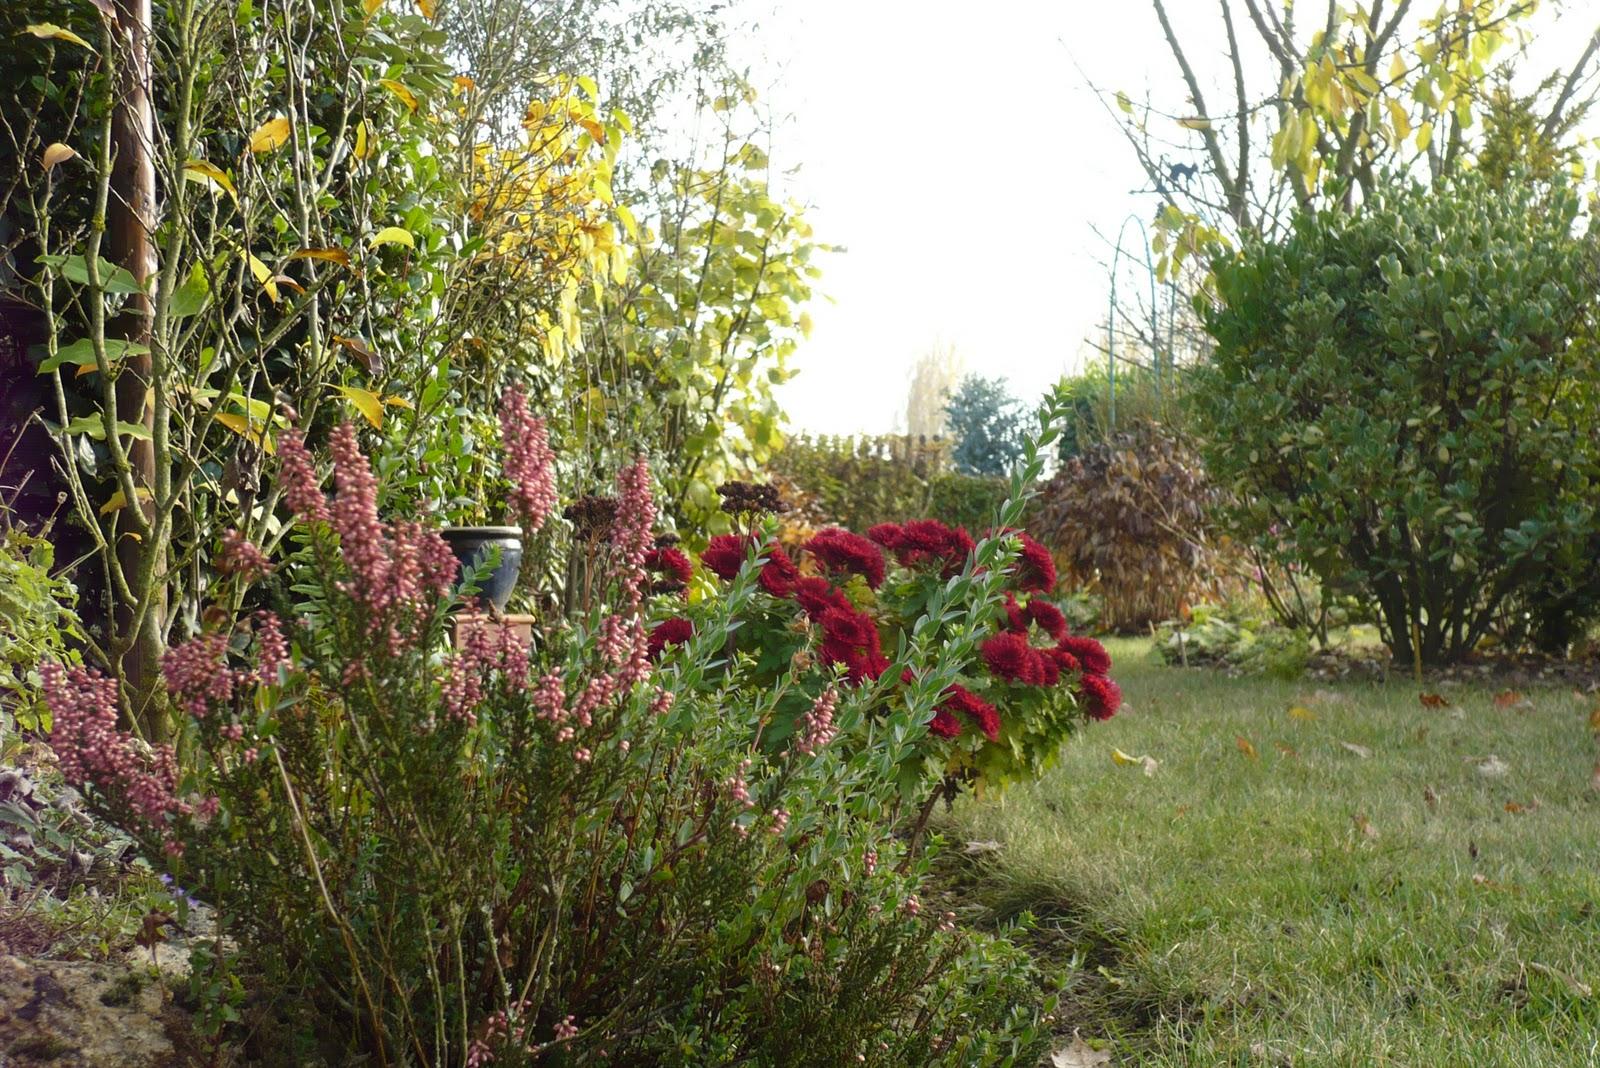 Le jardin de pacalou novembre au jardin - Jardin novembre ...